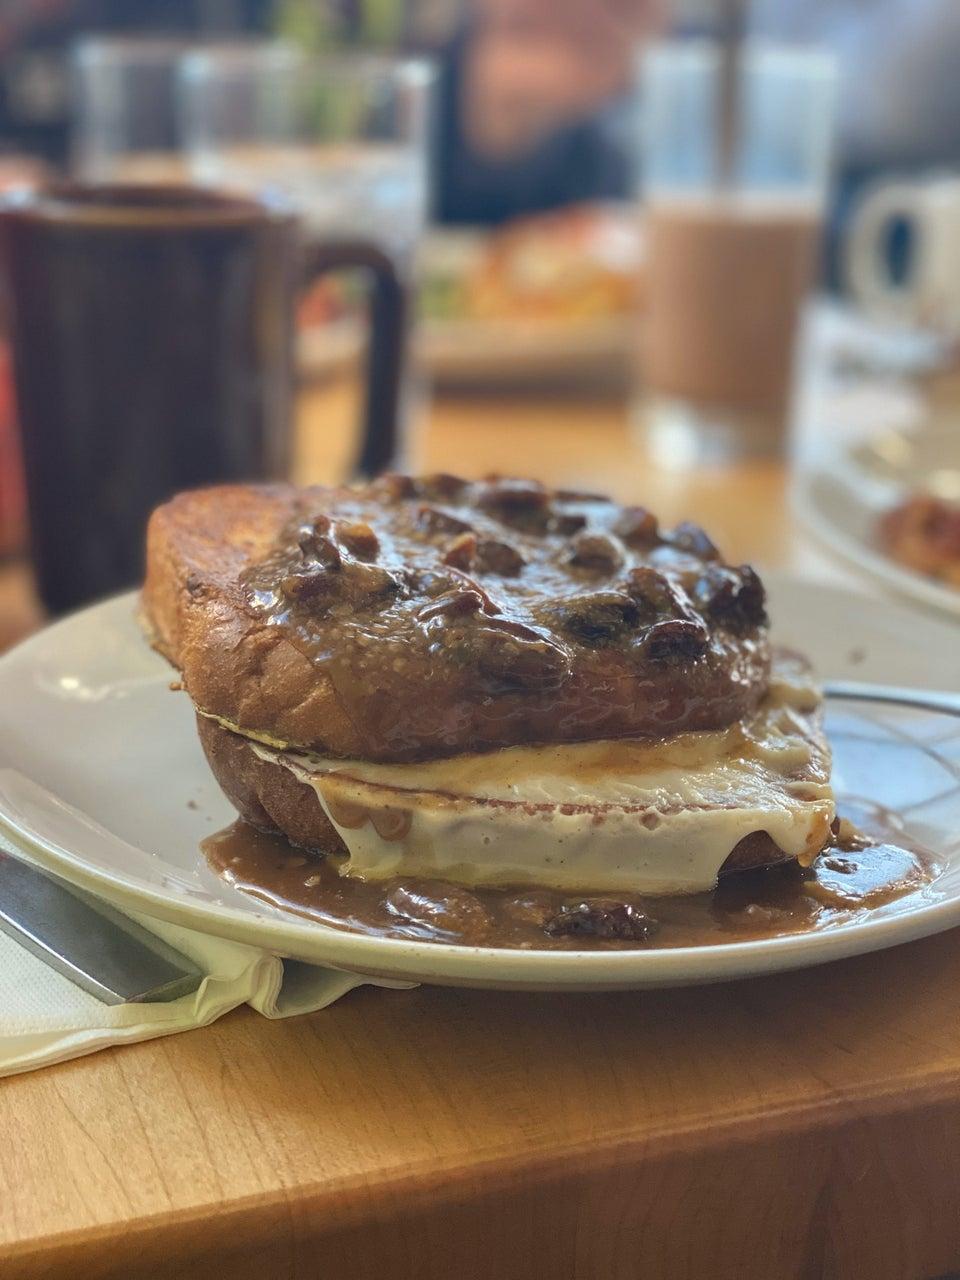 Cafe Madison 359 Northern Blvd, Albany